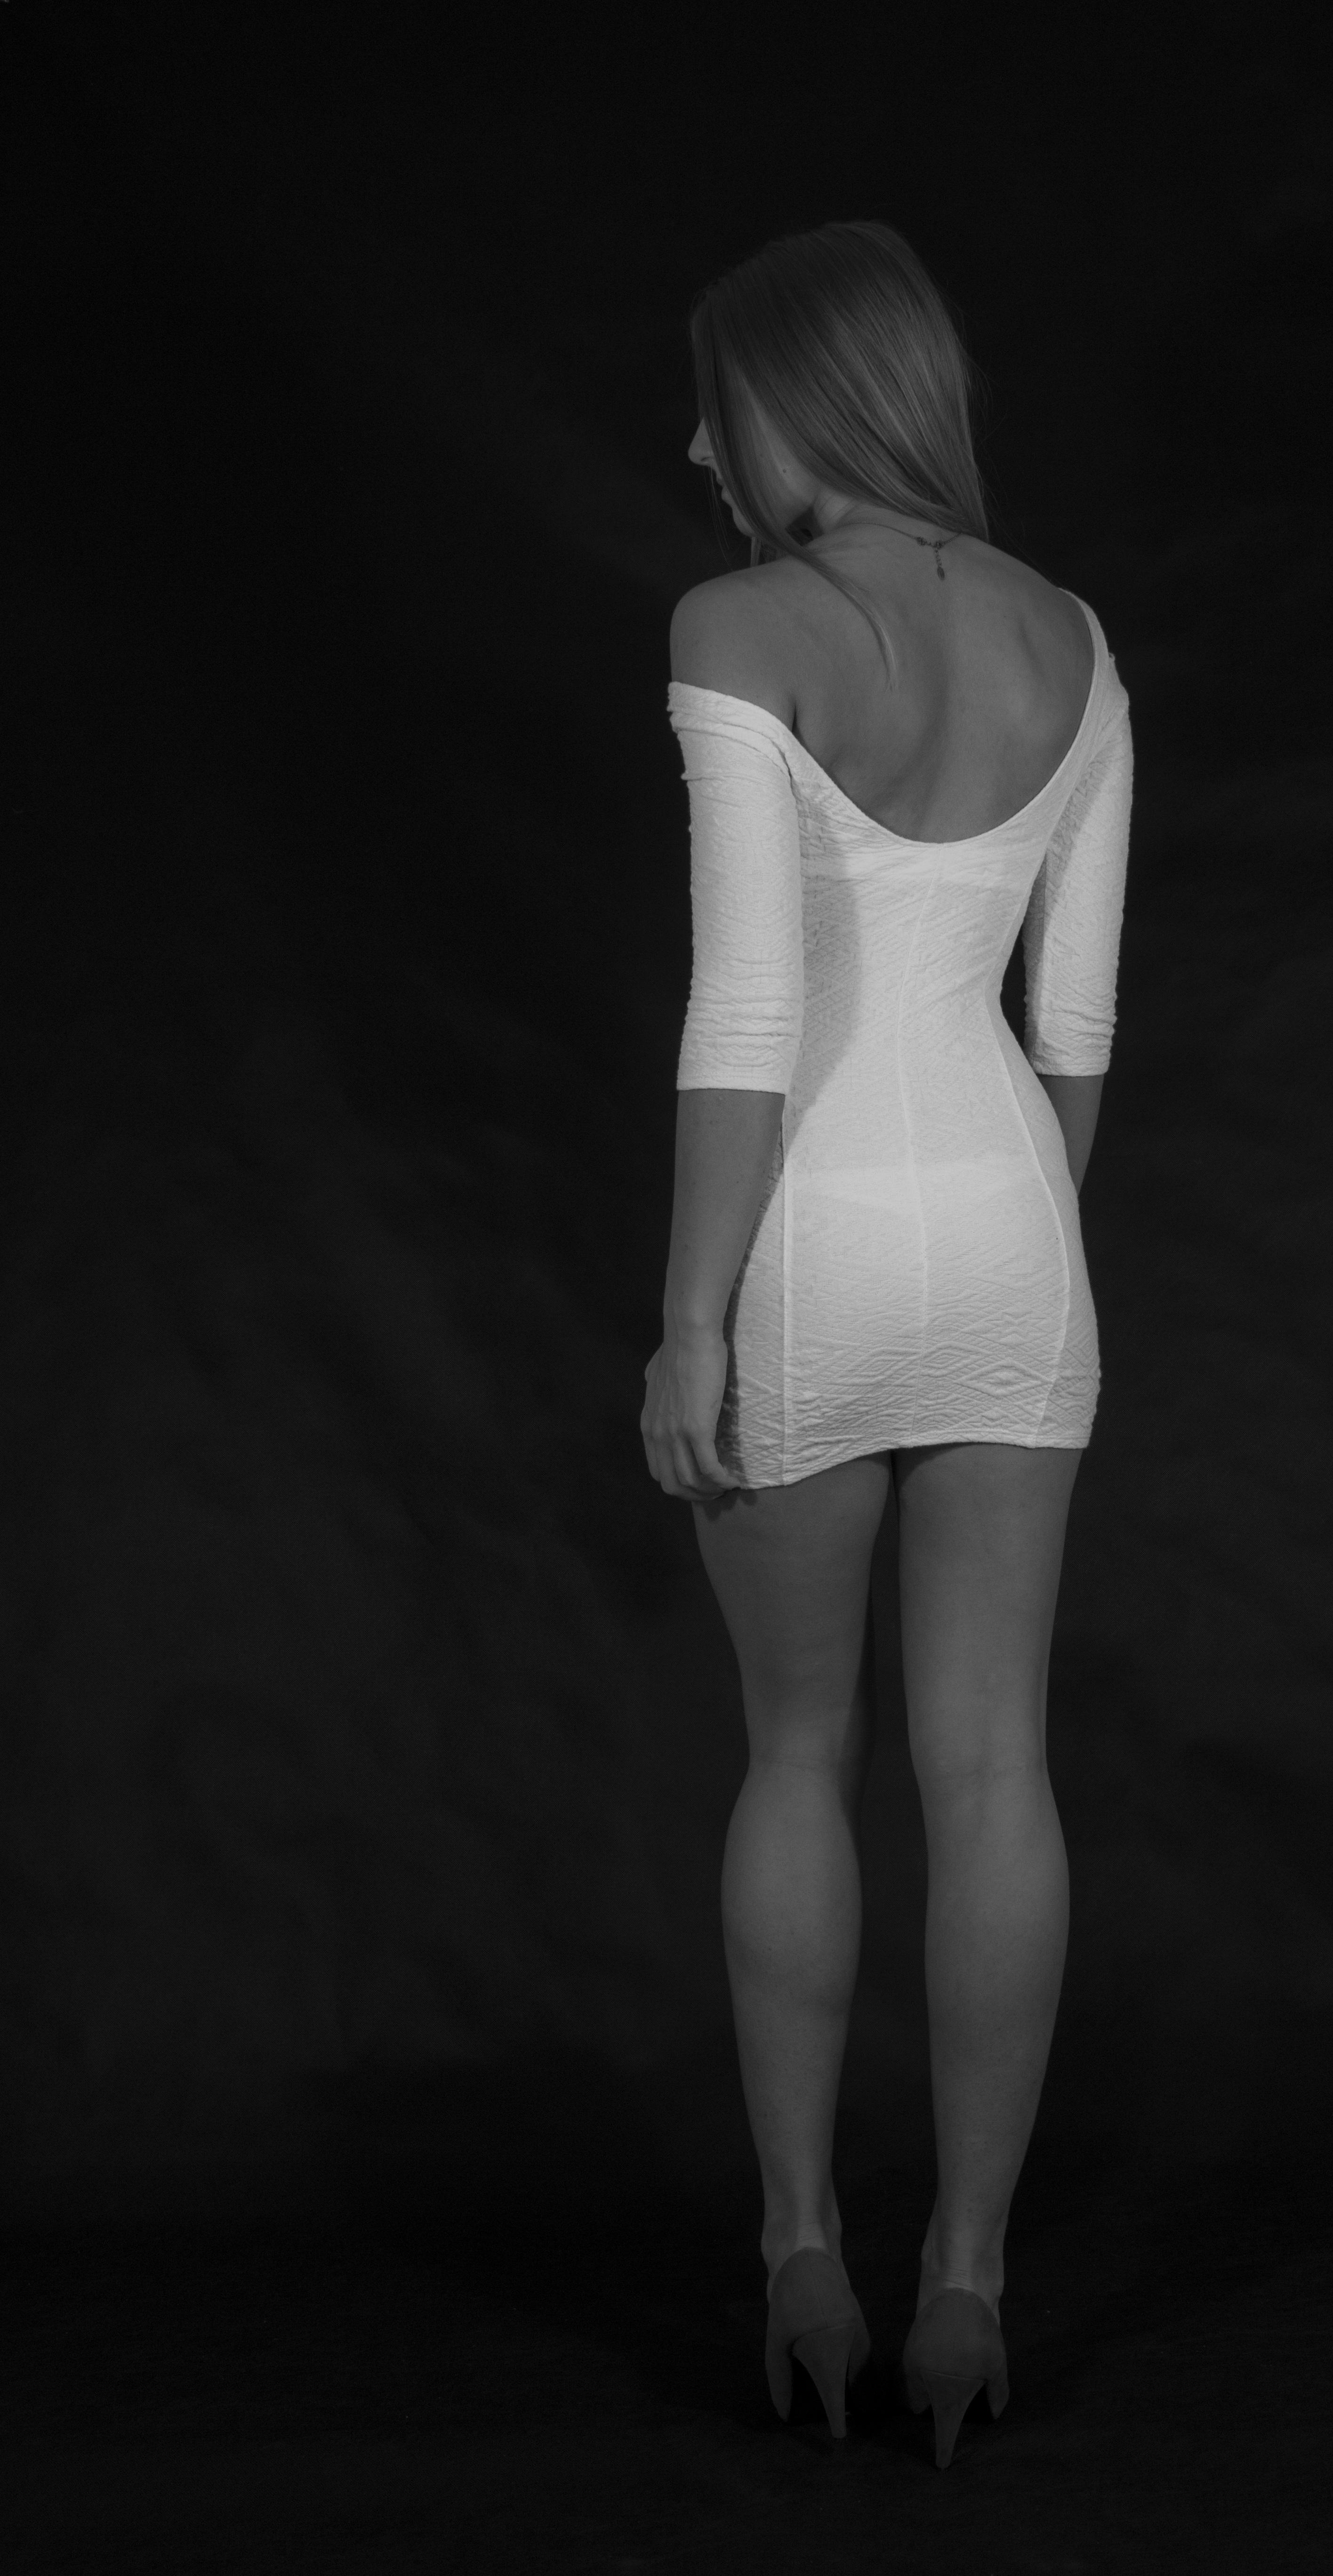 Erotic pics of womens backs — img 12